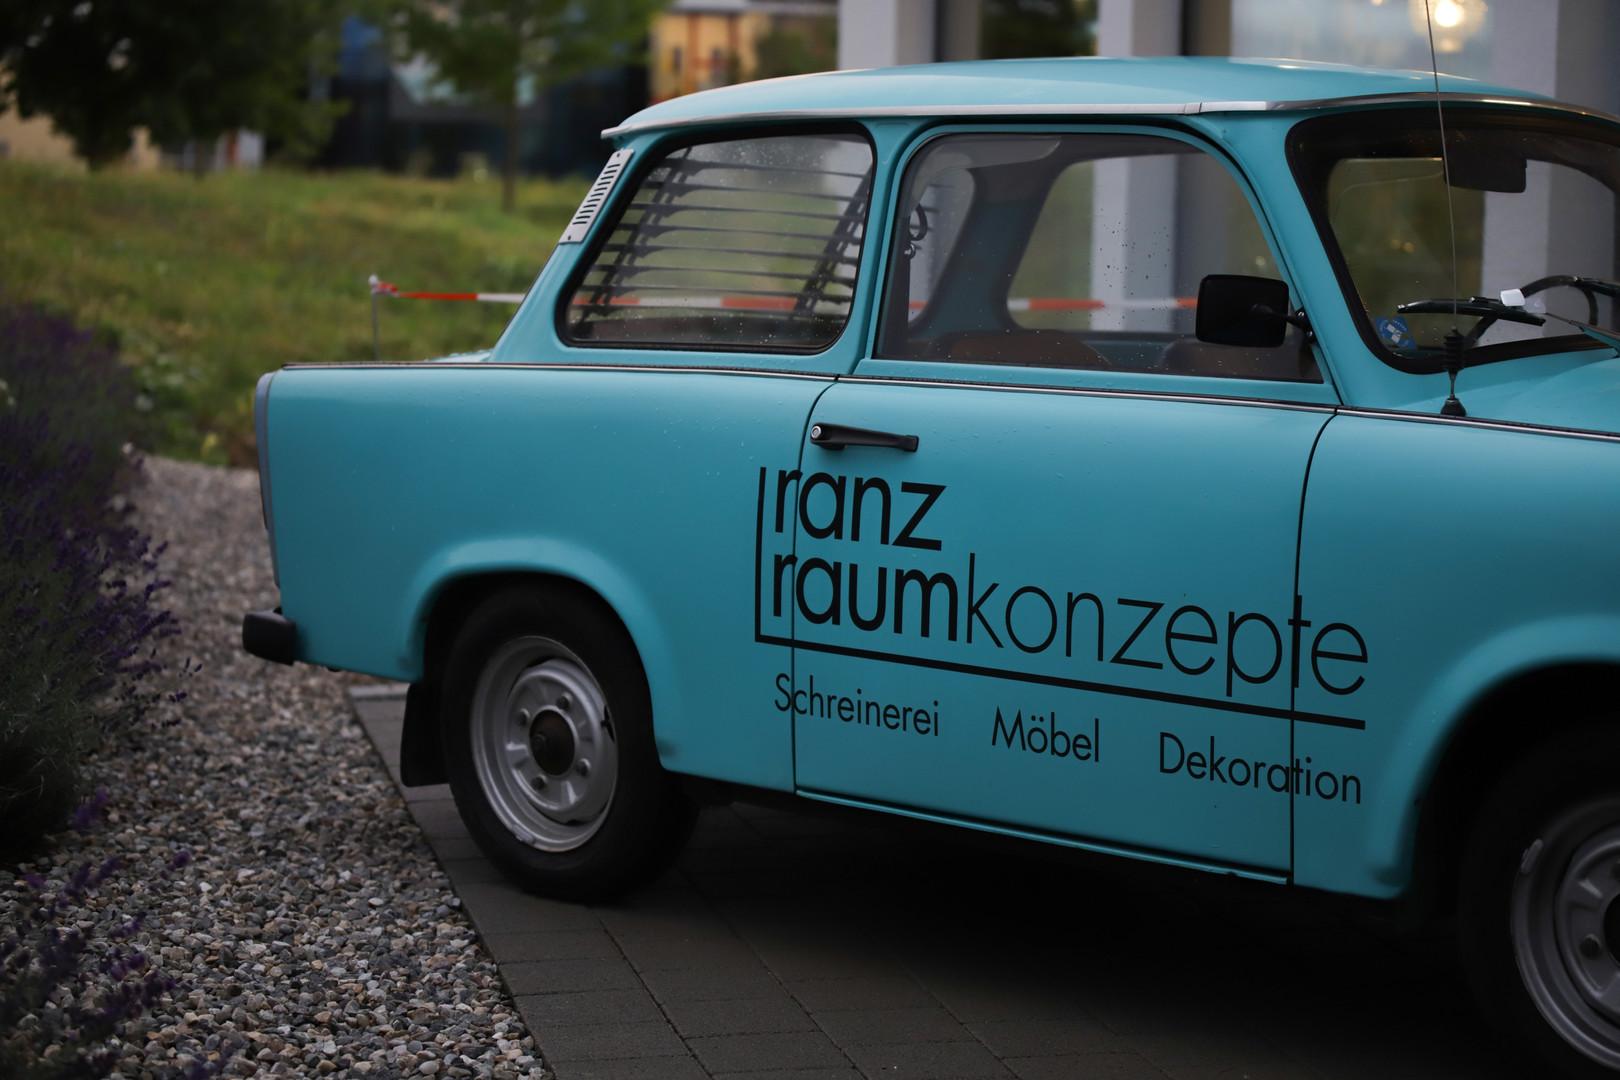 trabant-601-trabbi-schreinerei-martin-ra